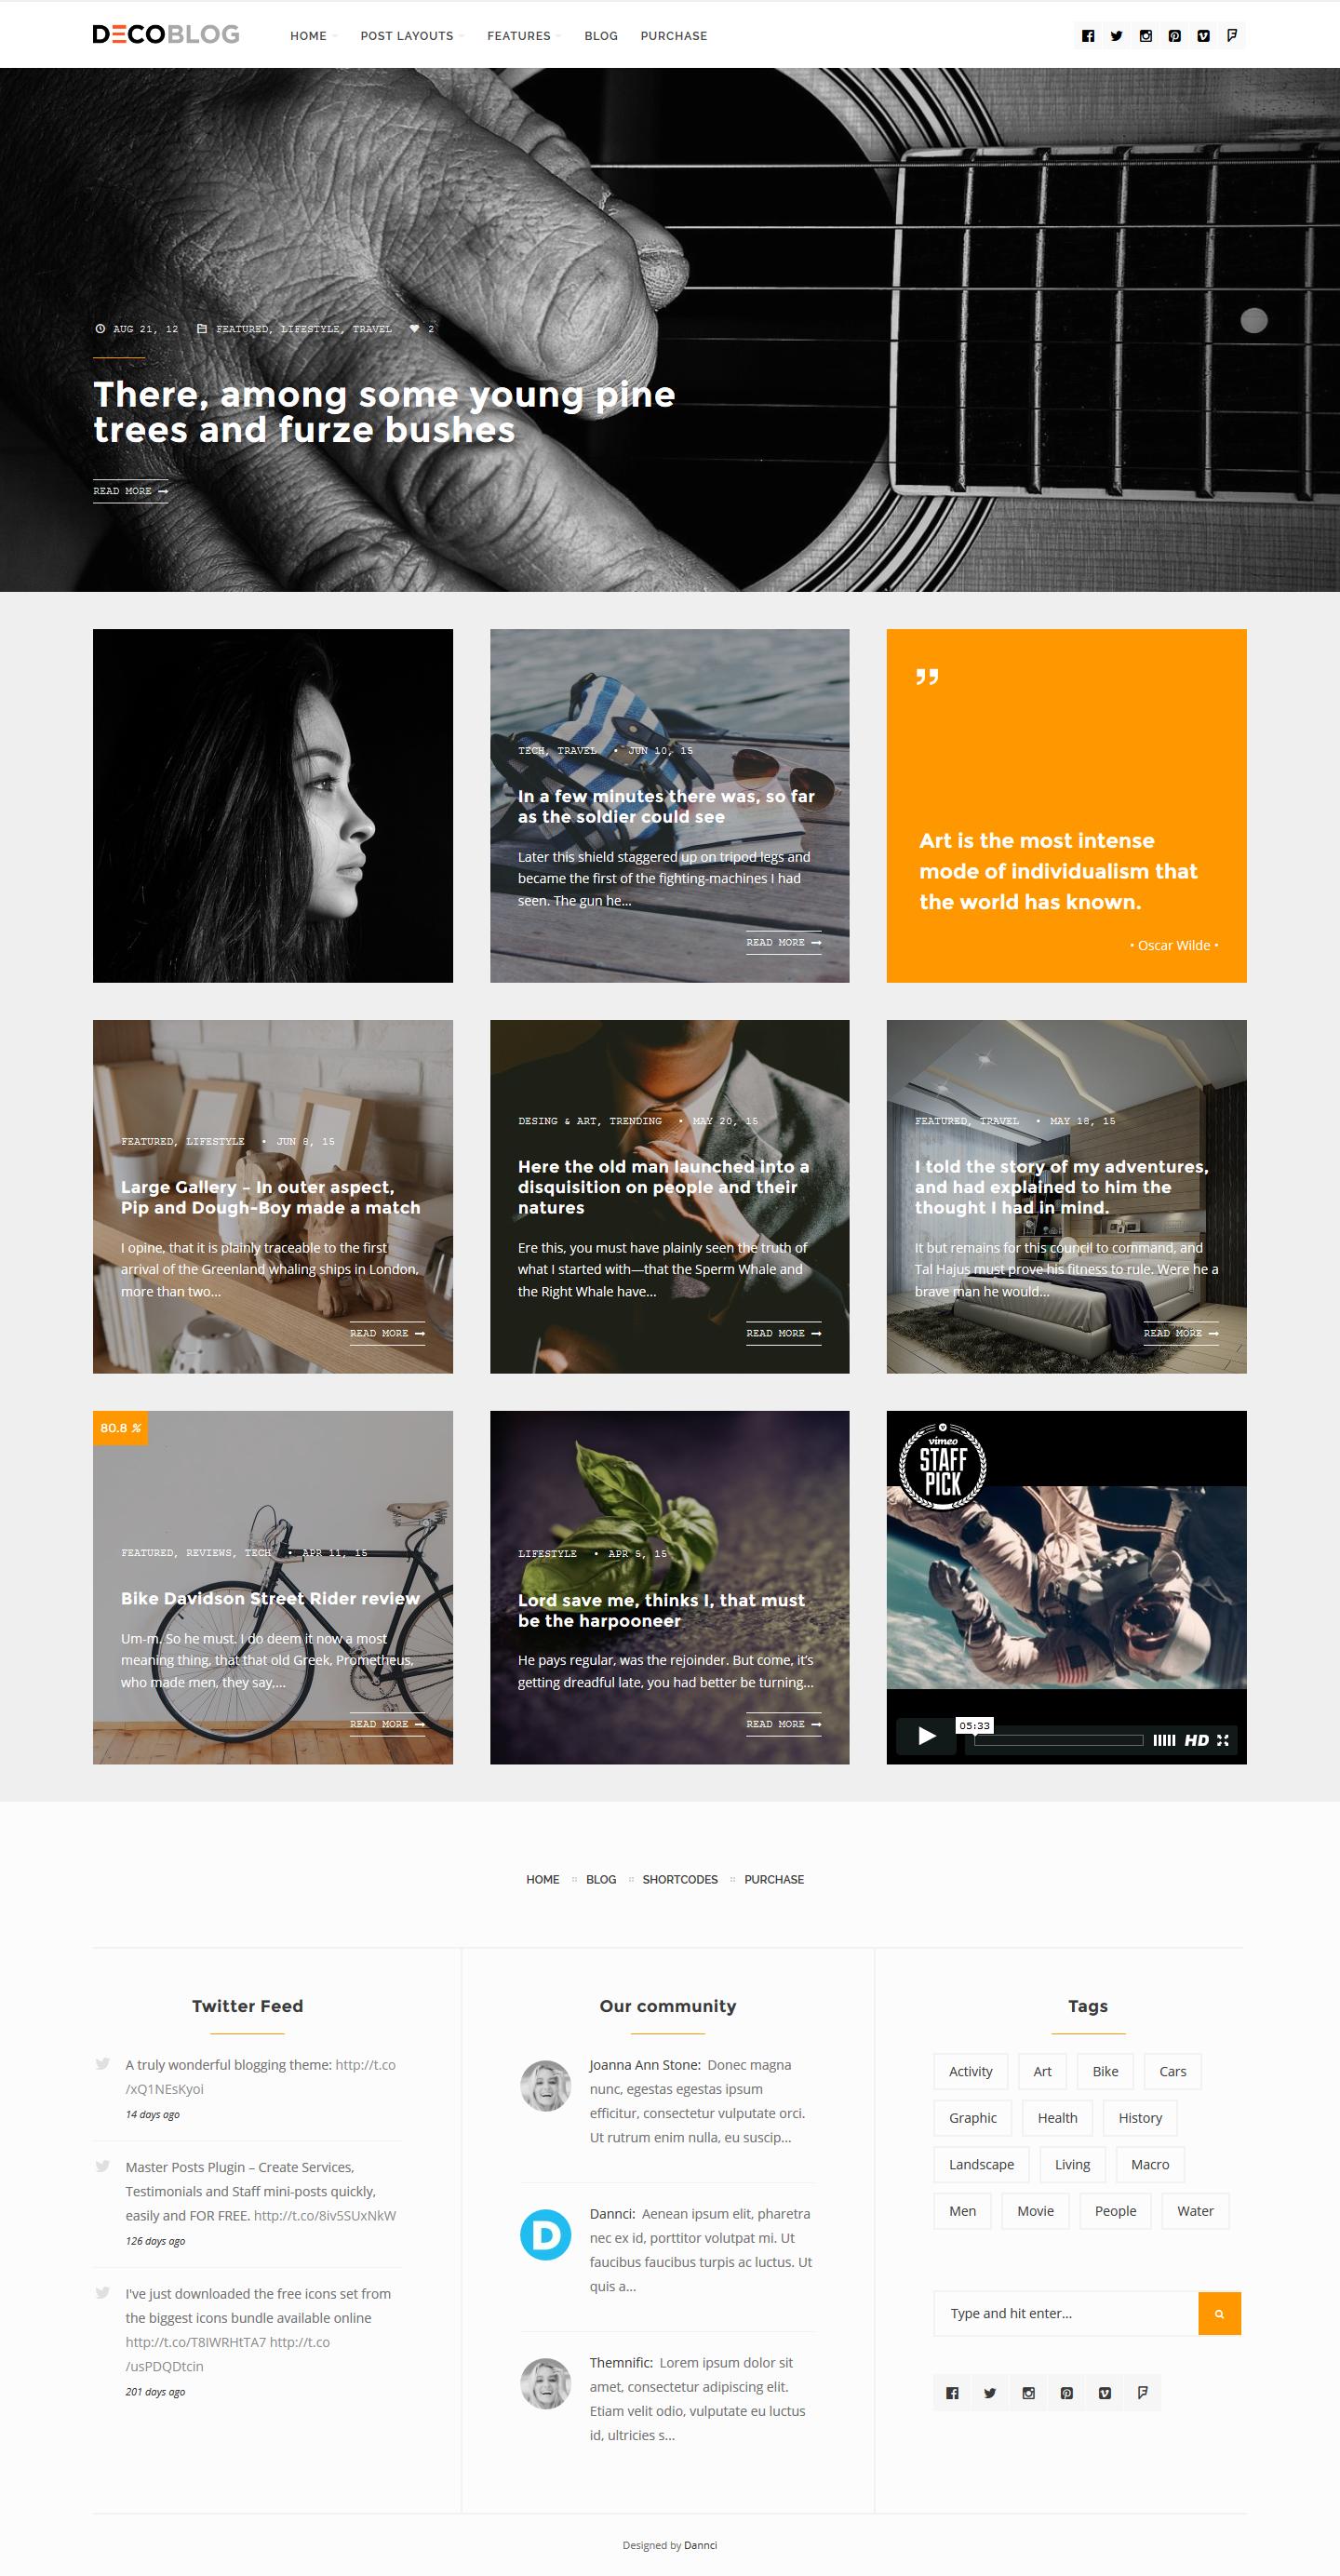 Decoblog - Lifestyle / Personal Blog Theme by Dannci | ThemeForest